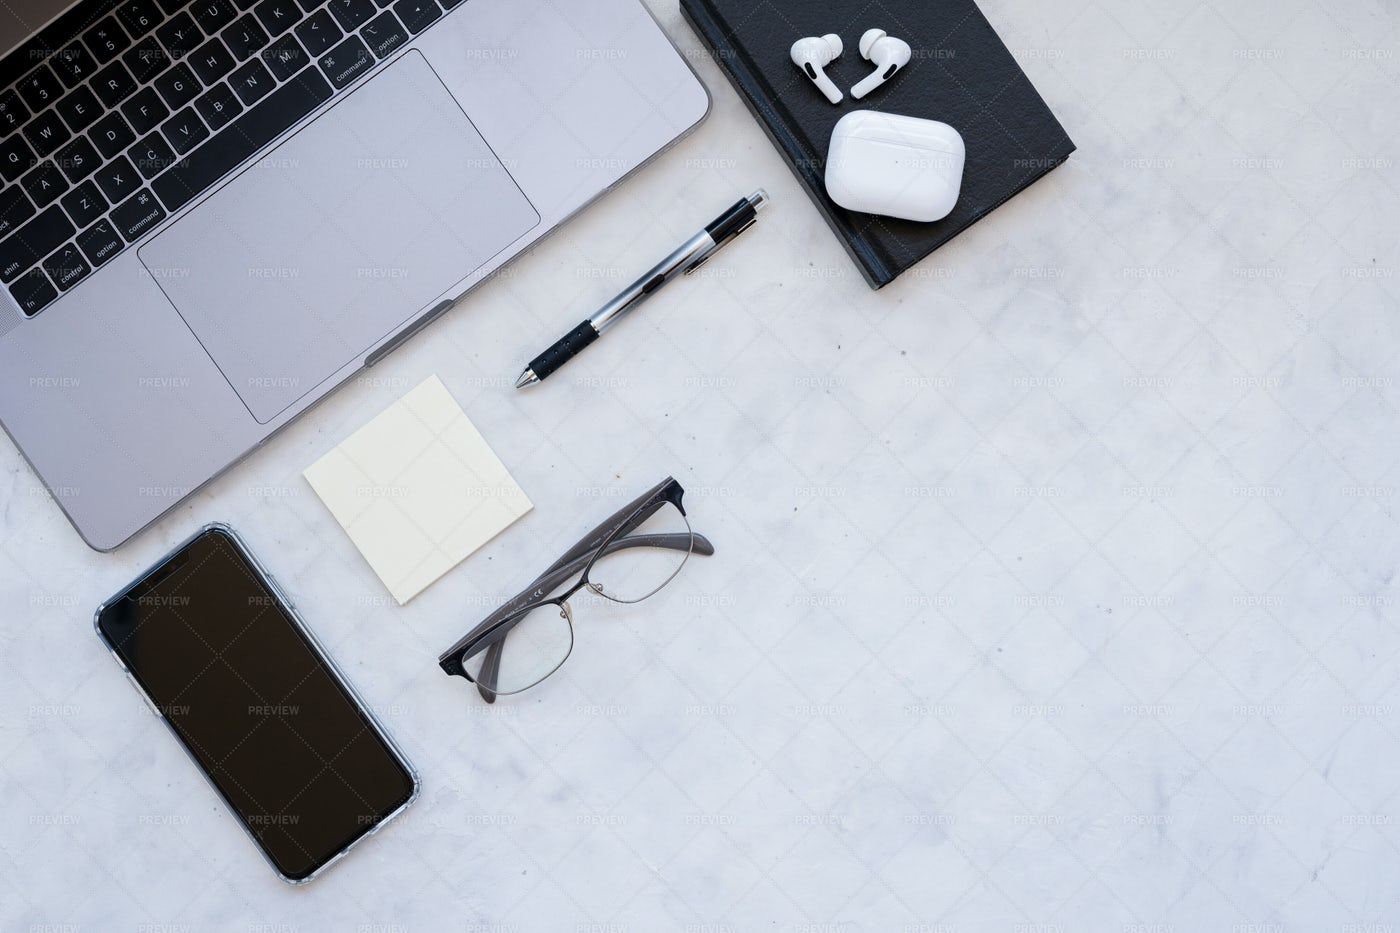 Monochrome Workspace: Stock Photos